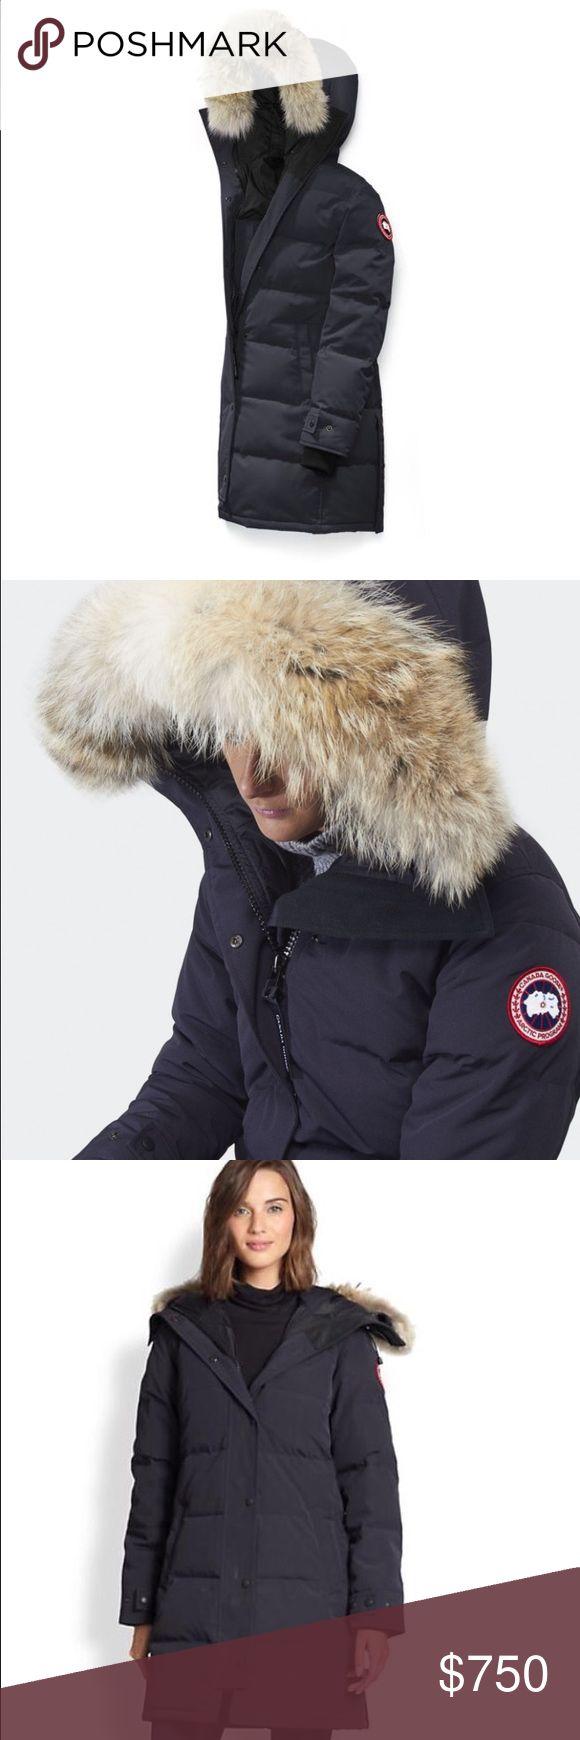 Navy Blue Canada Goose Shelburne Parka Best in Class Winter Parka Canada Goose Jackets & Coats Utility Jackets